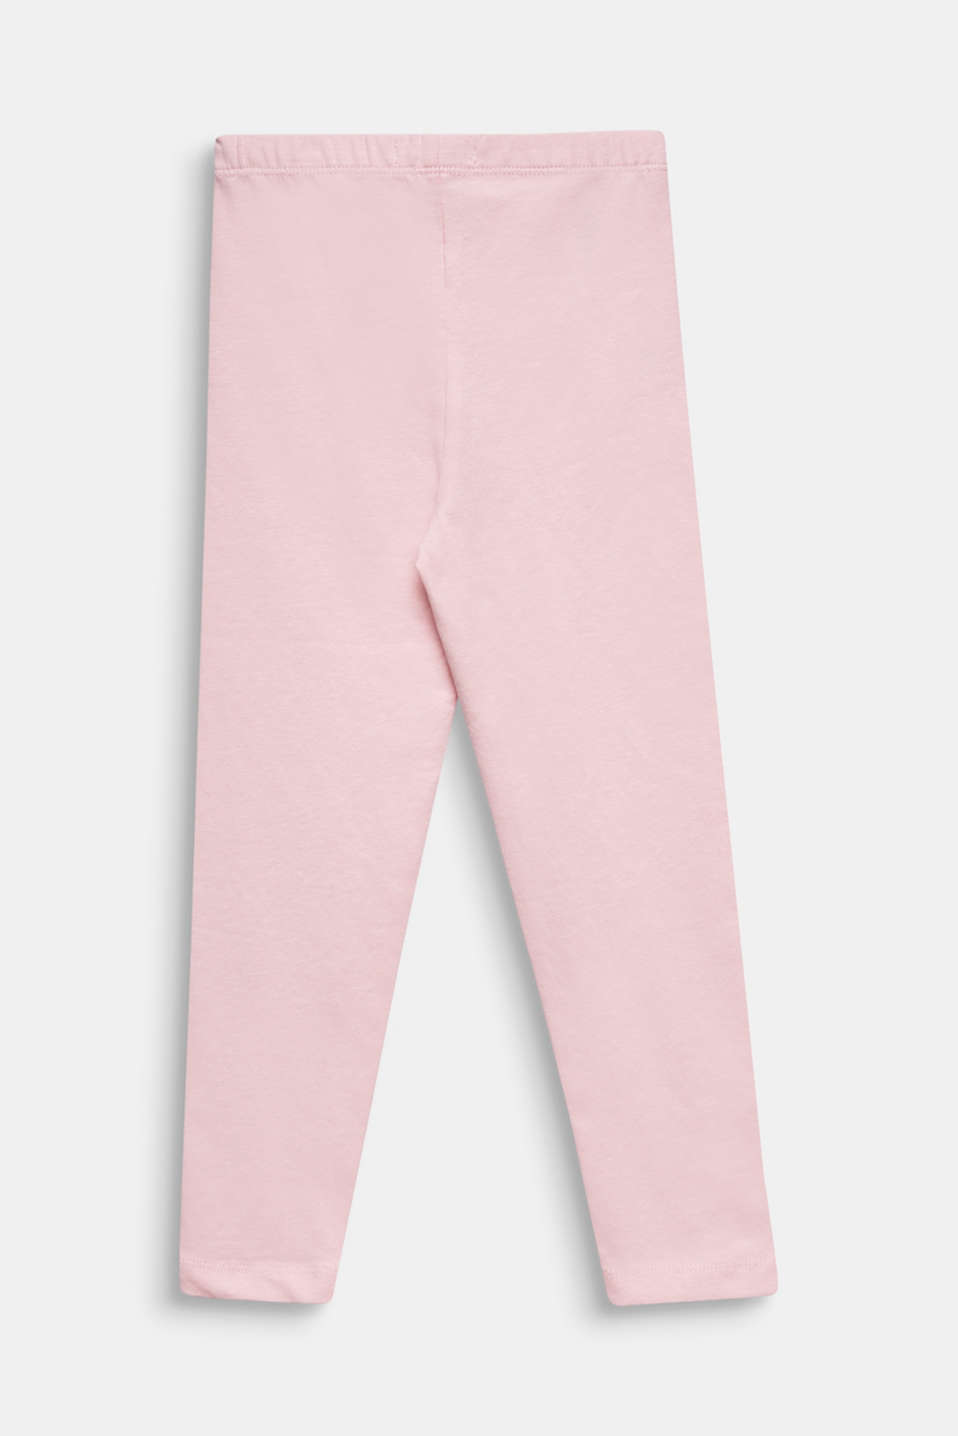 Opaque basic leggings, LIGHT PINK, detail image number 1